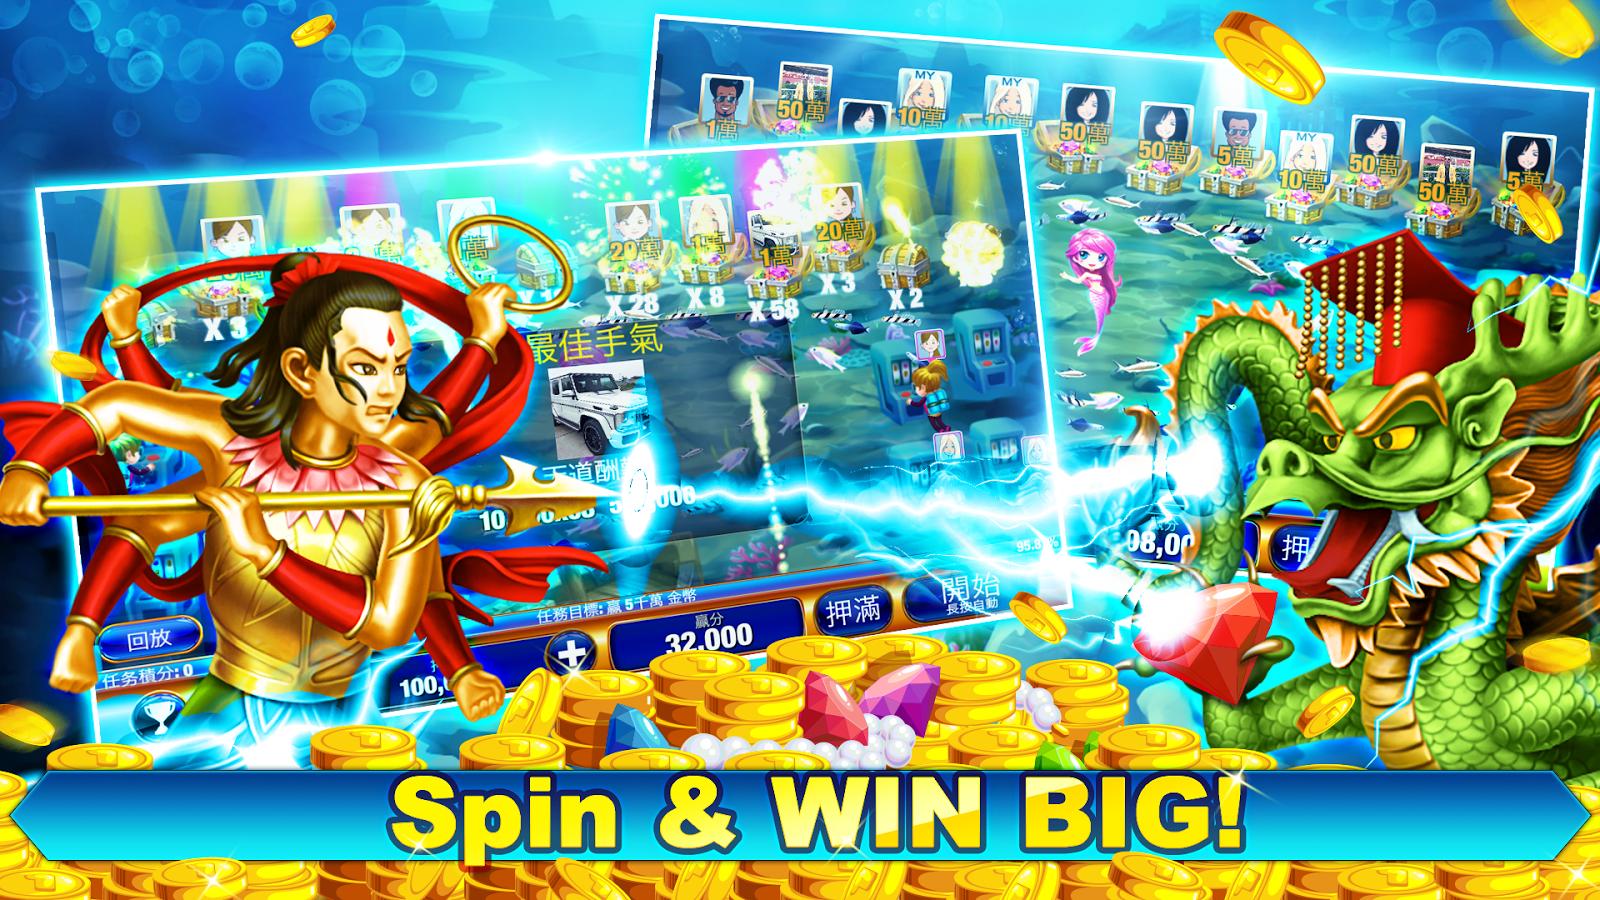 grand royal casino online